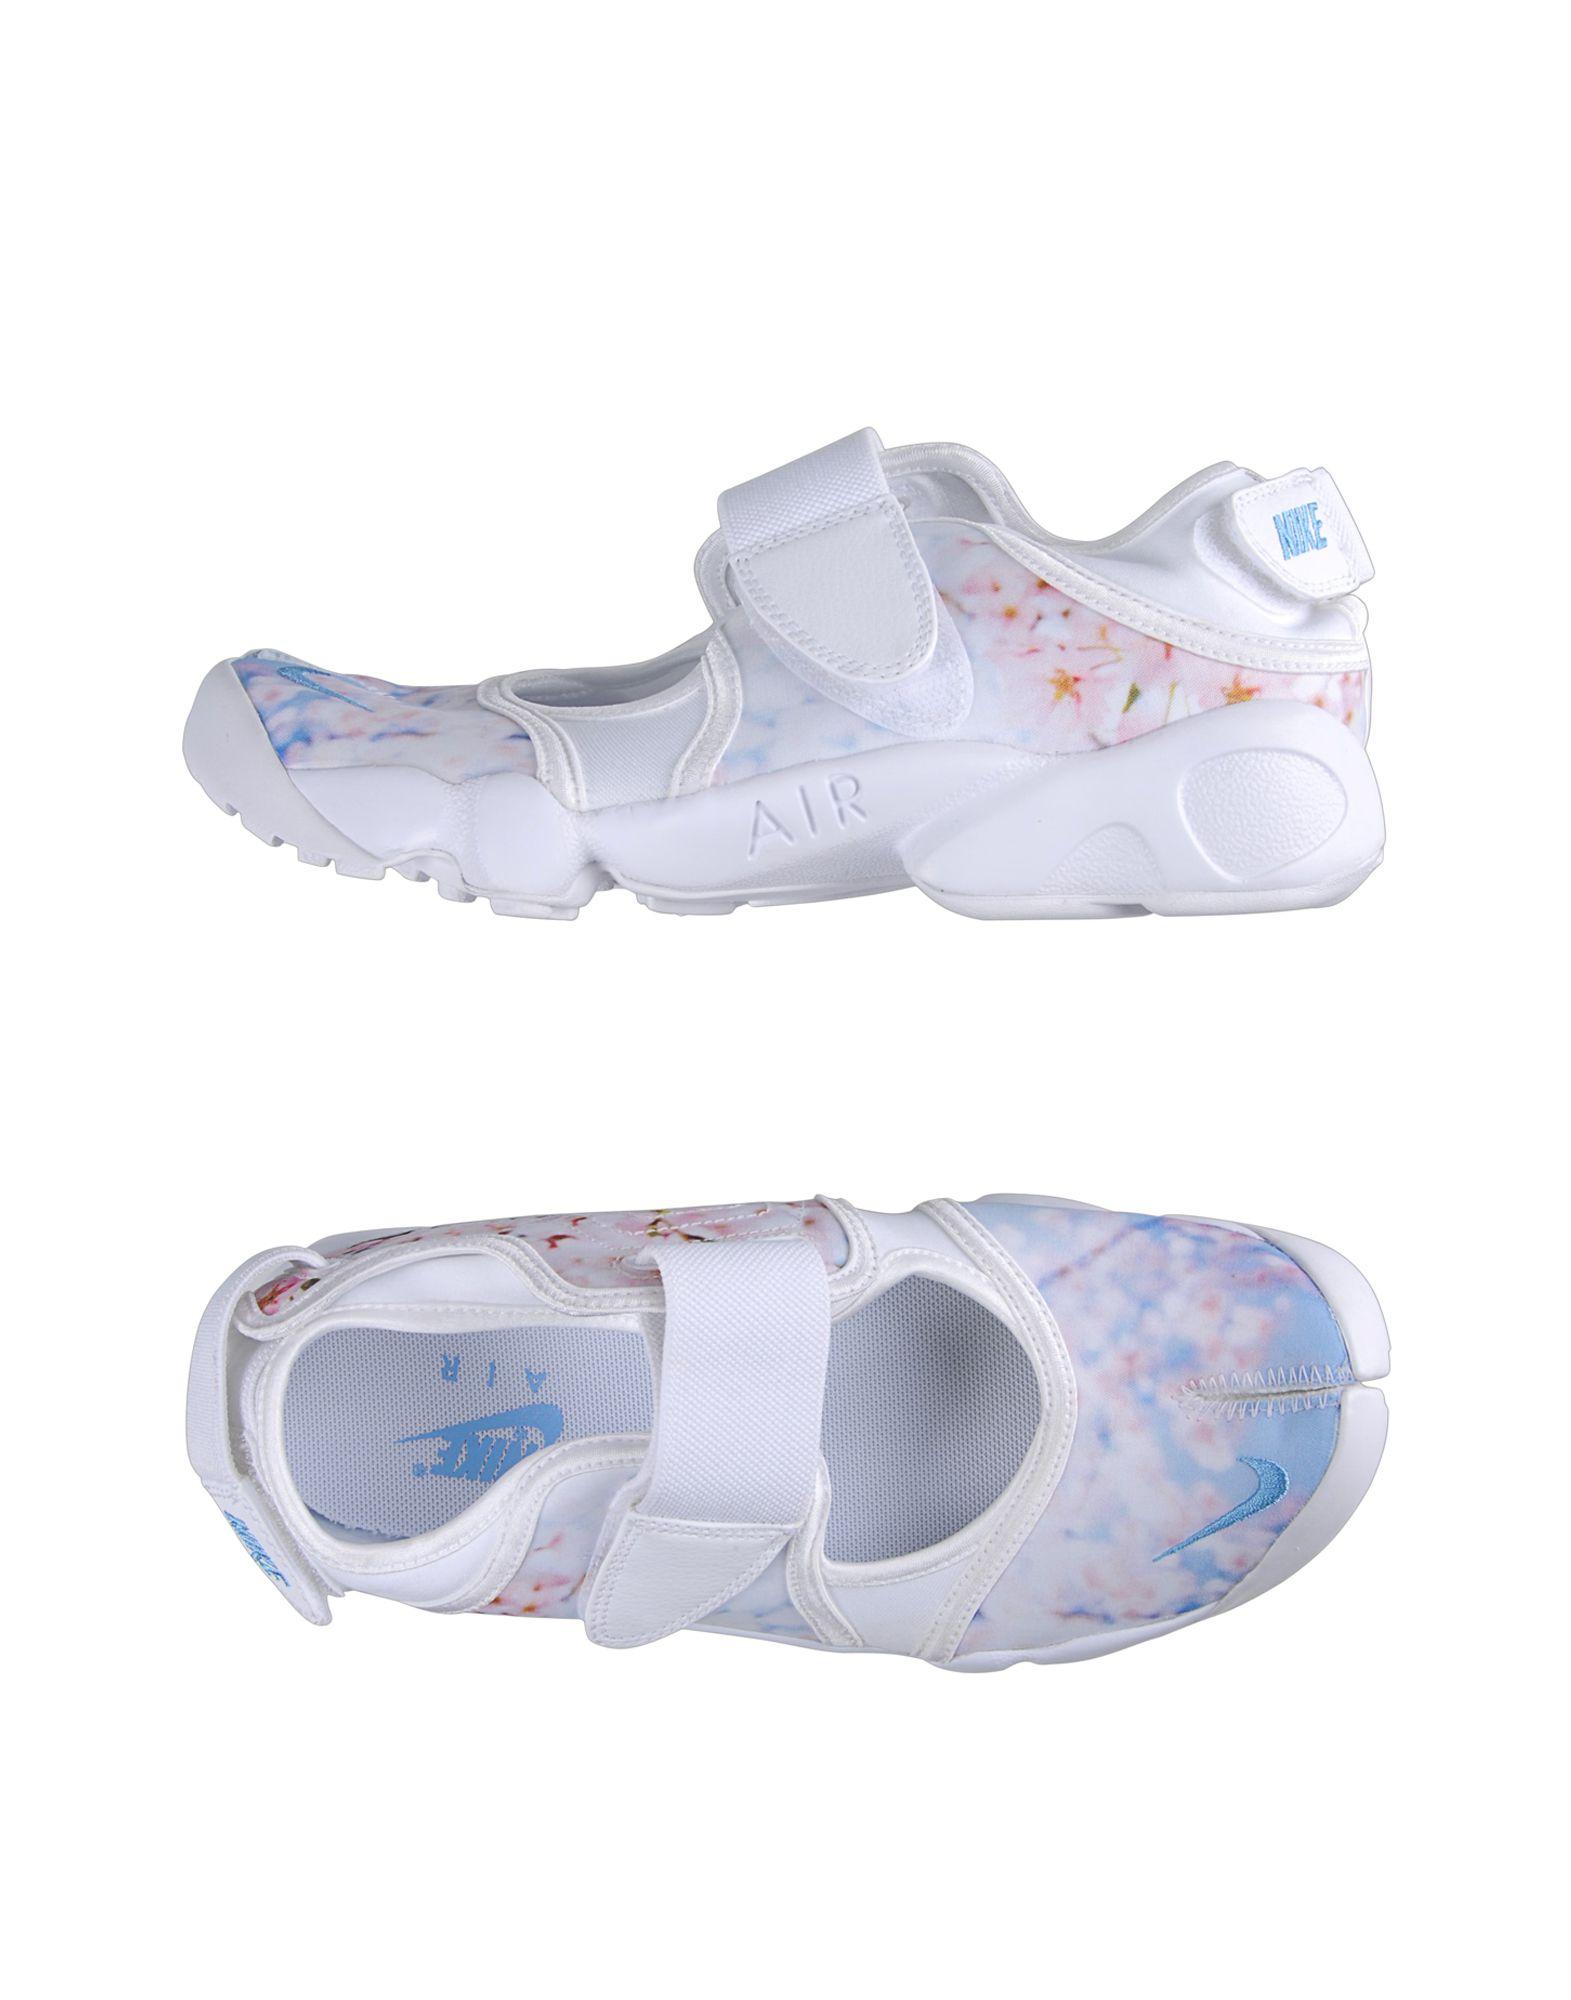 Sneakers Nike Wmns Air Rift Print - Femme - Sneakers Nike sur